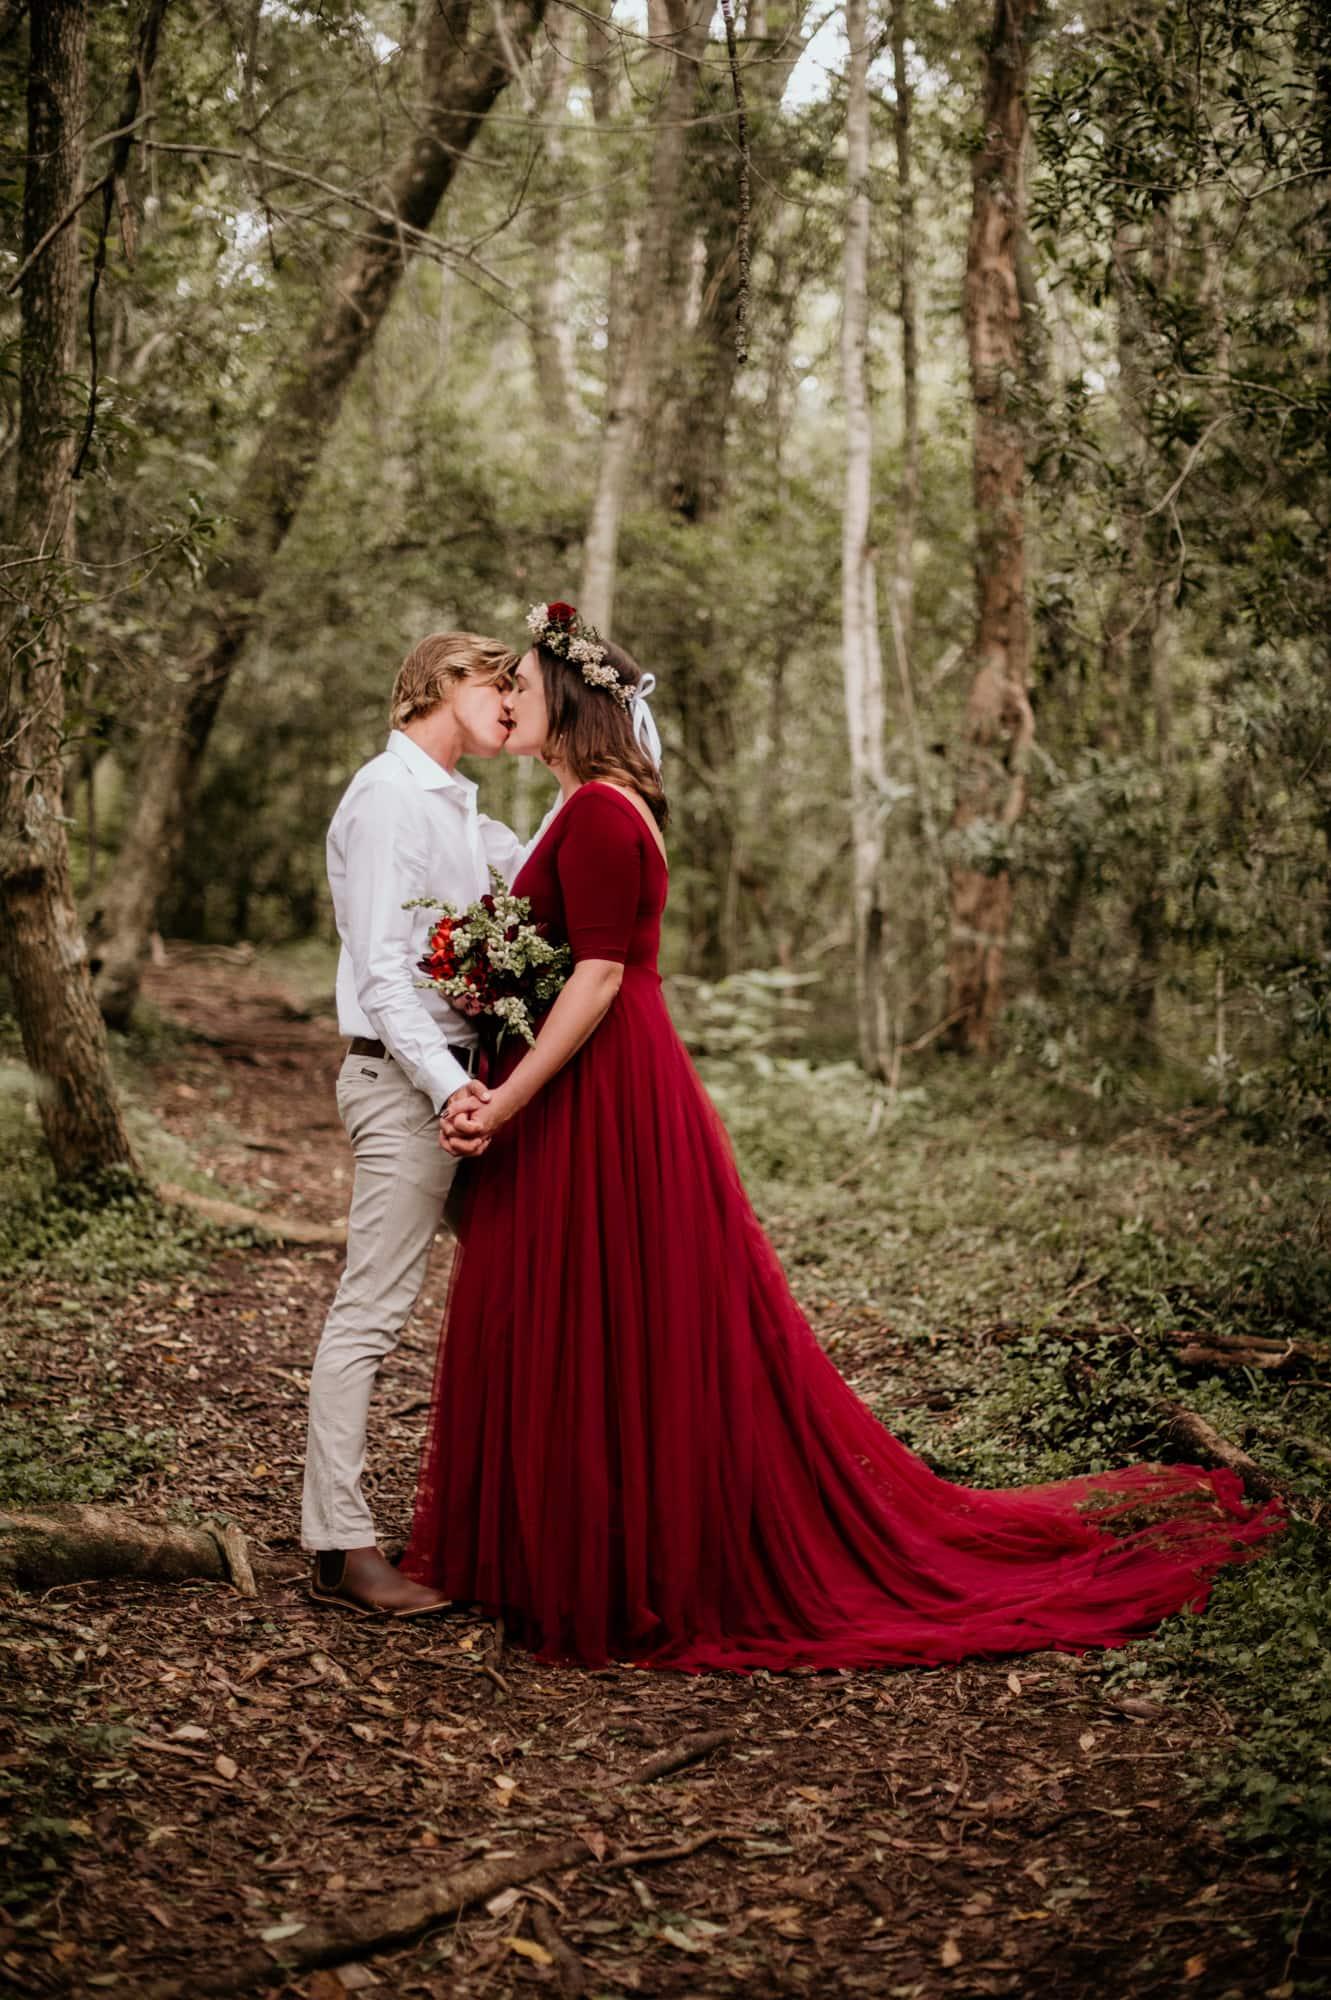 wesley-lanie-george-fernridge-engagement-June-Richards-Photography-Destination-Weddings-Elopements-Garden-Route-31